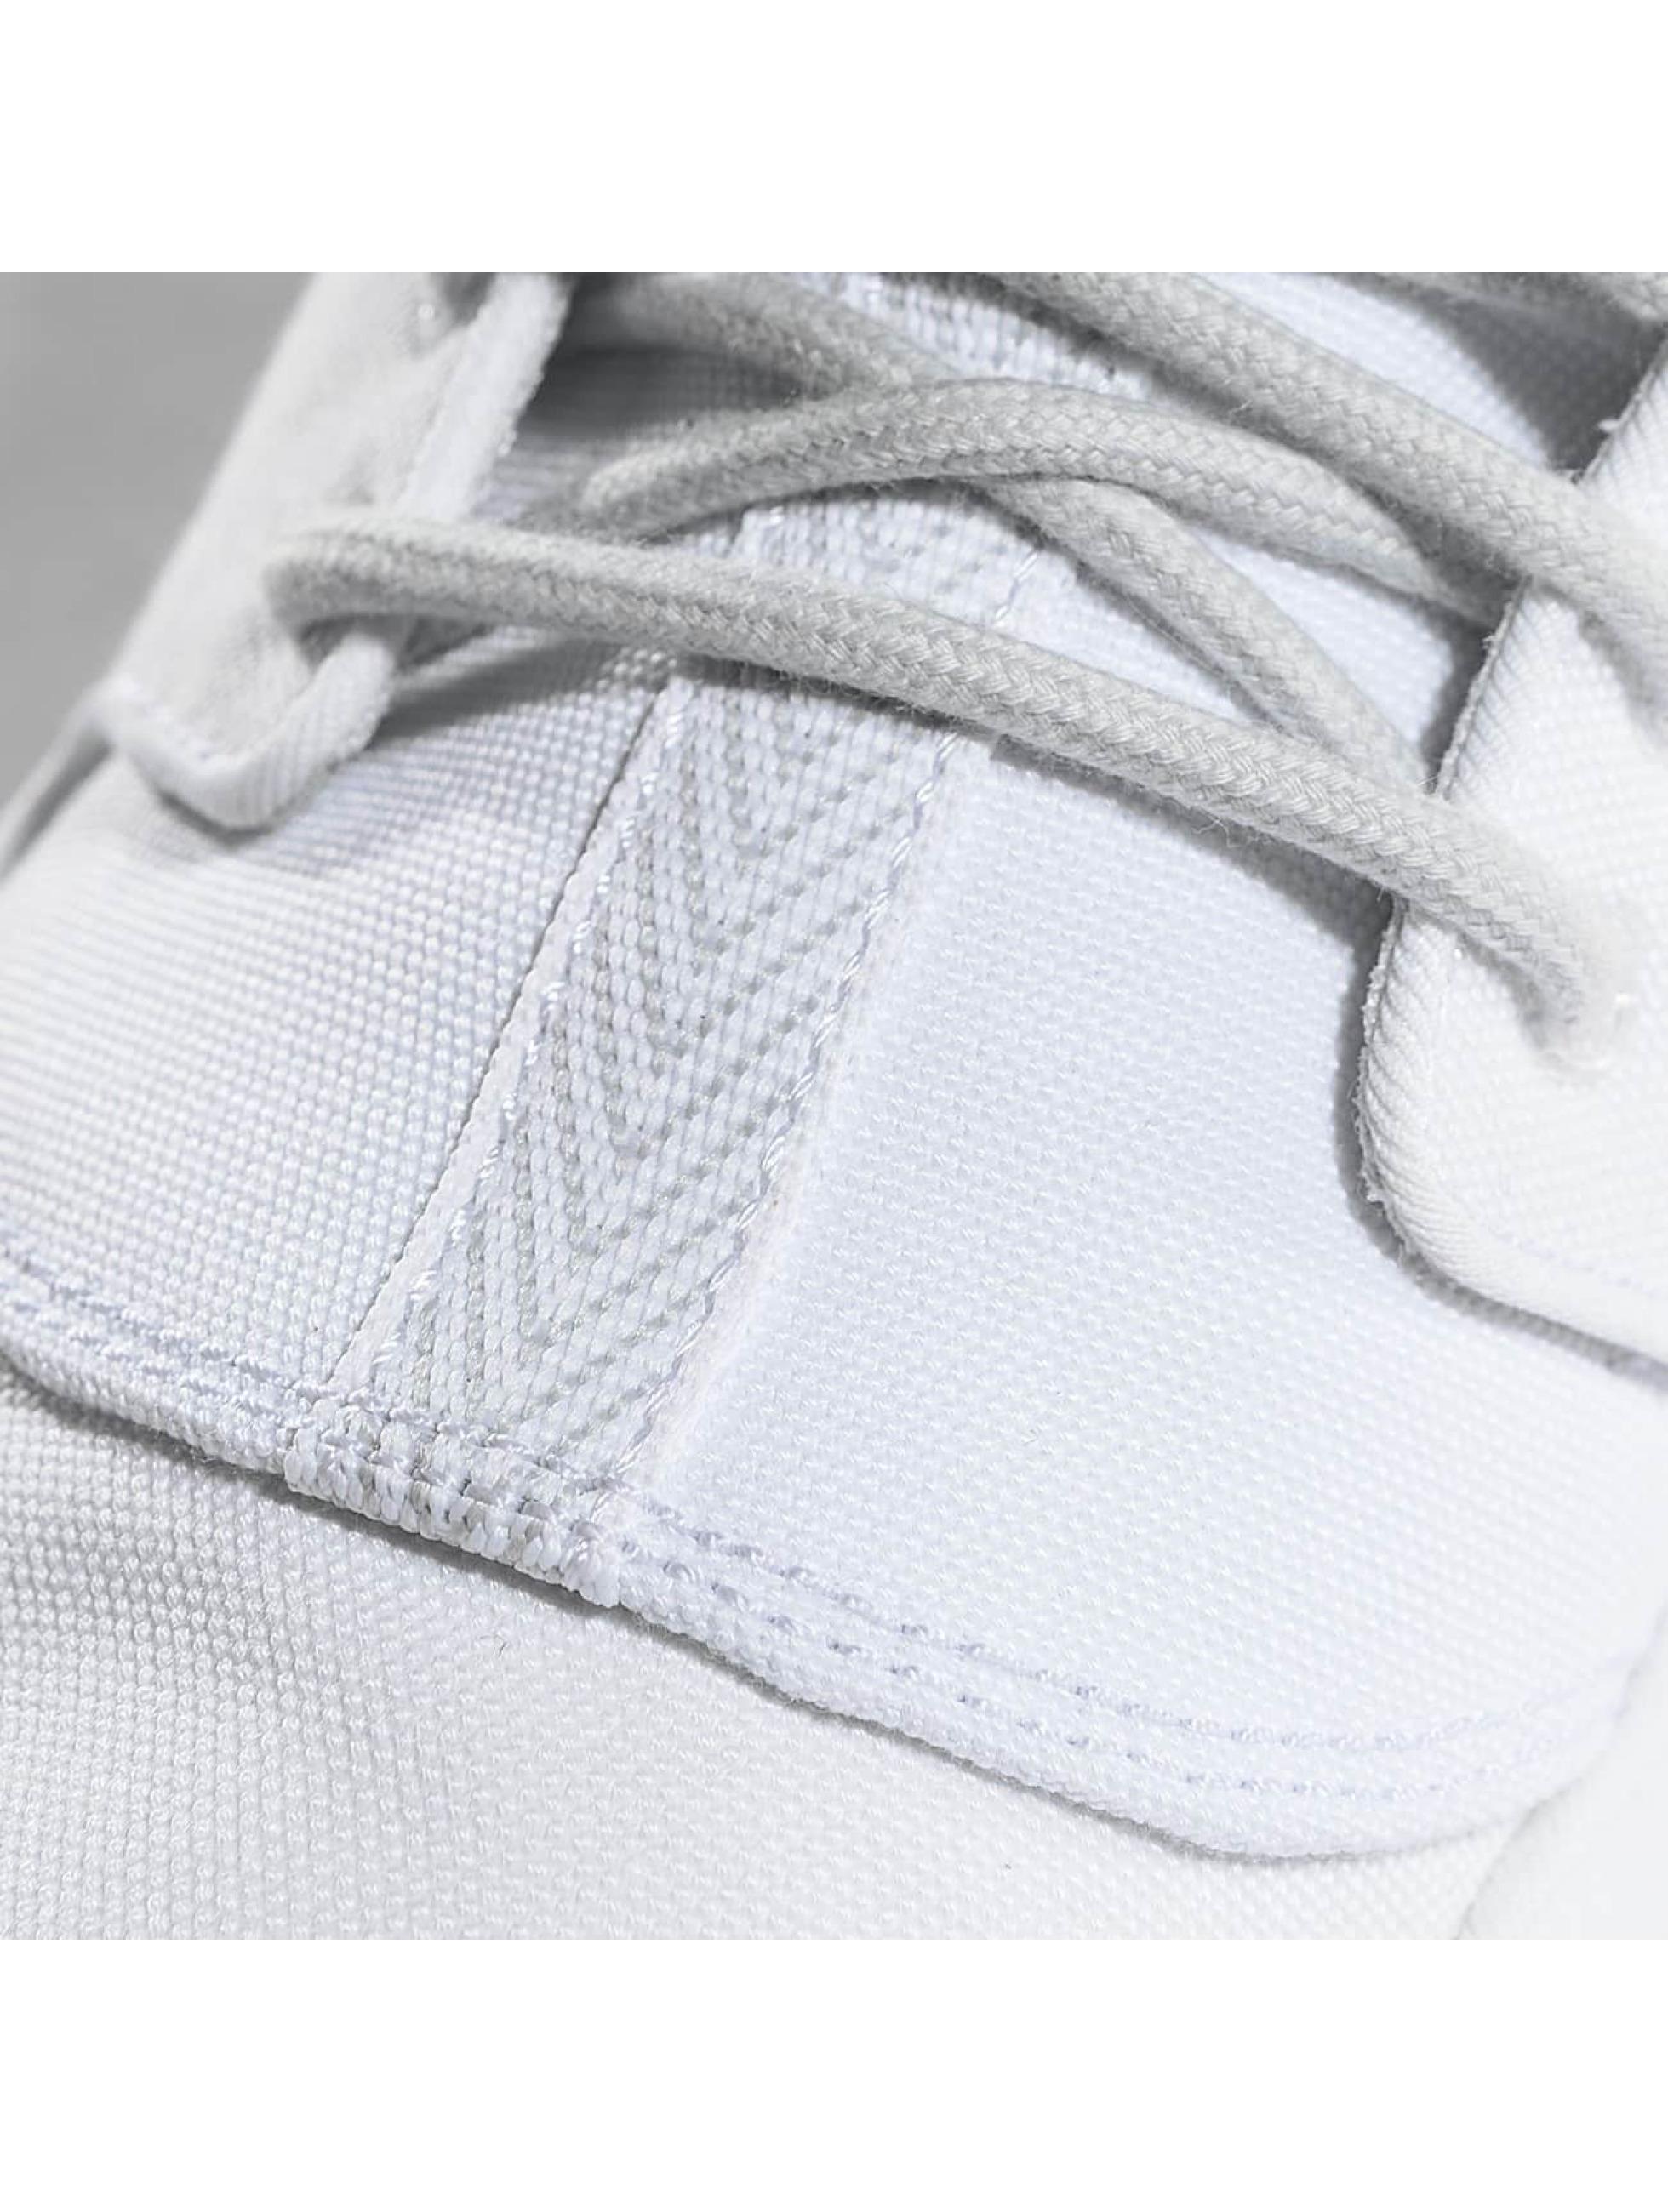 Jordan Sneakers Eclipse Chukka white